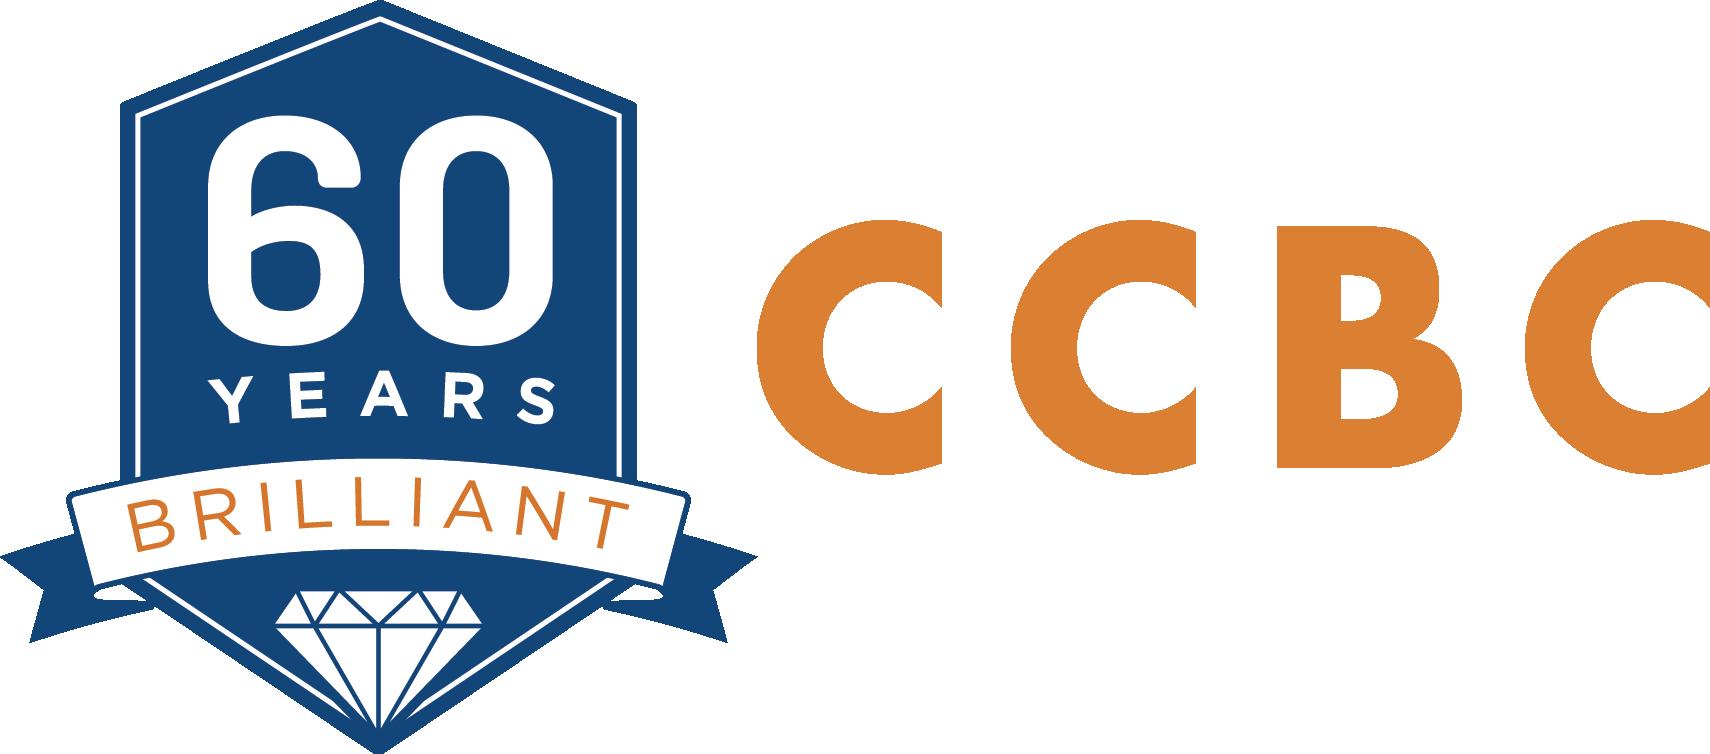 CCBC 60 Years Brilliant logo